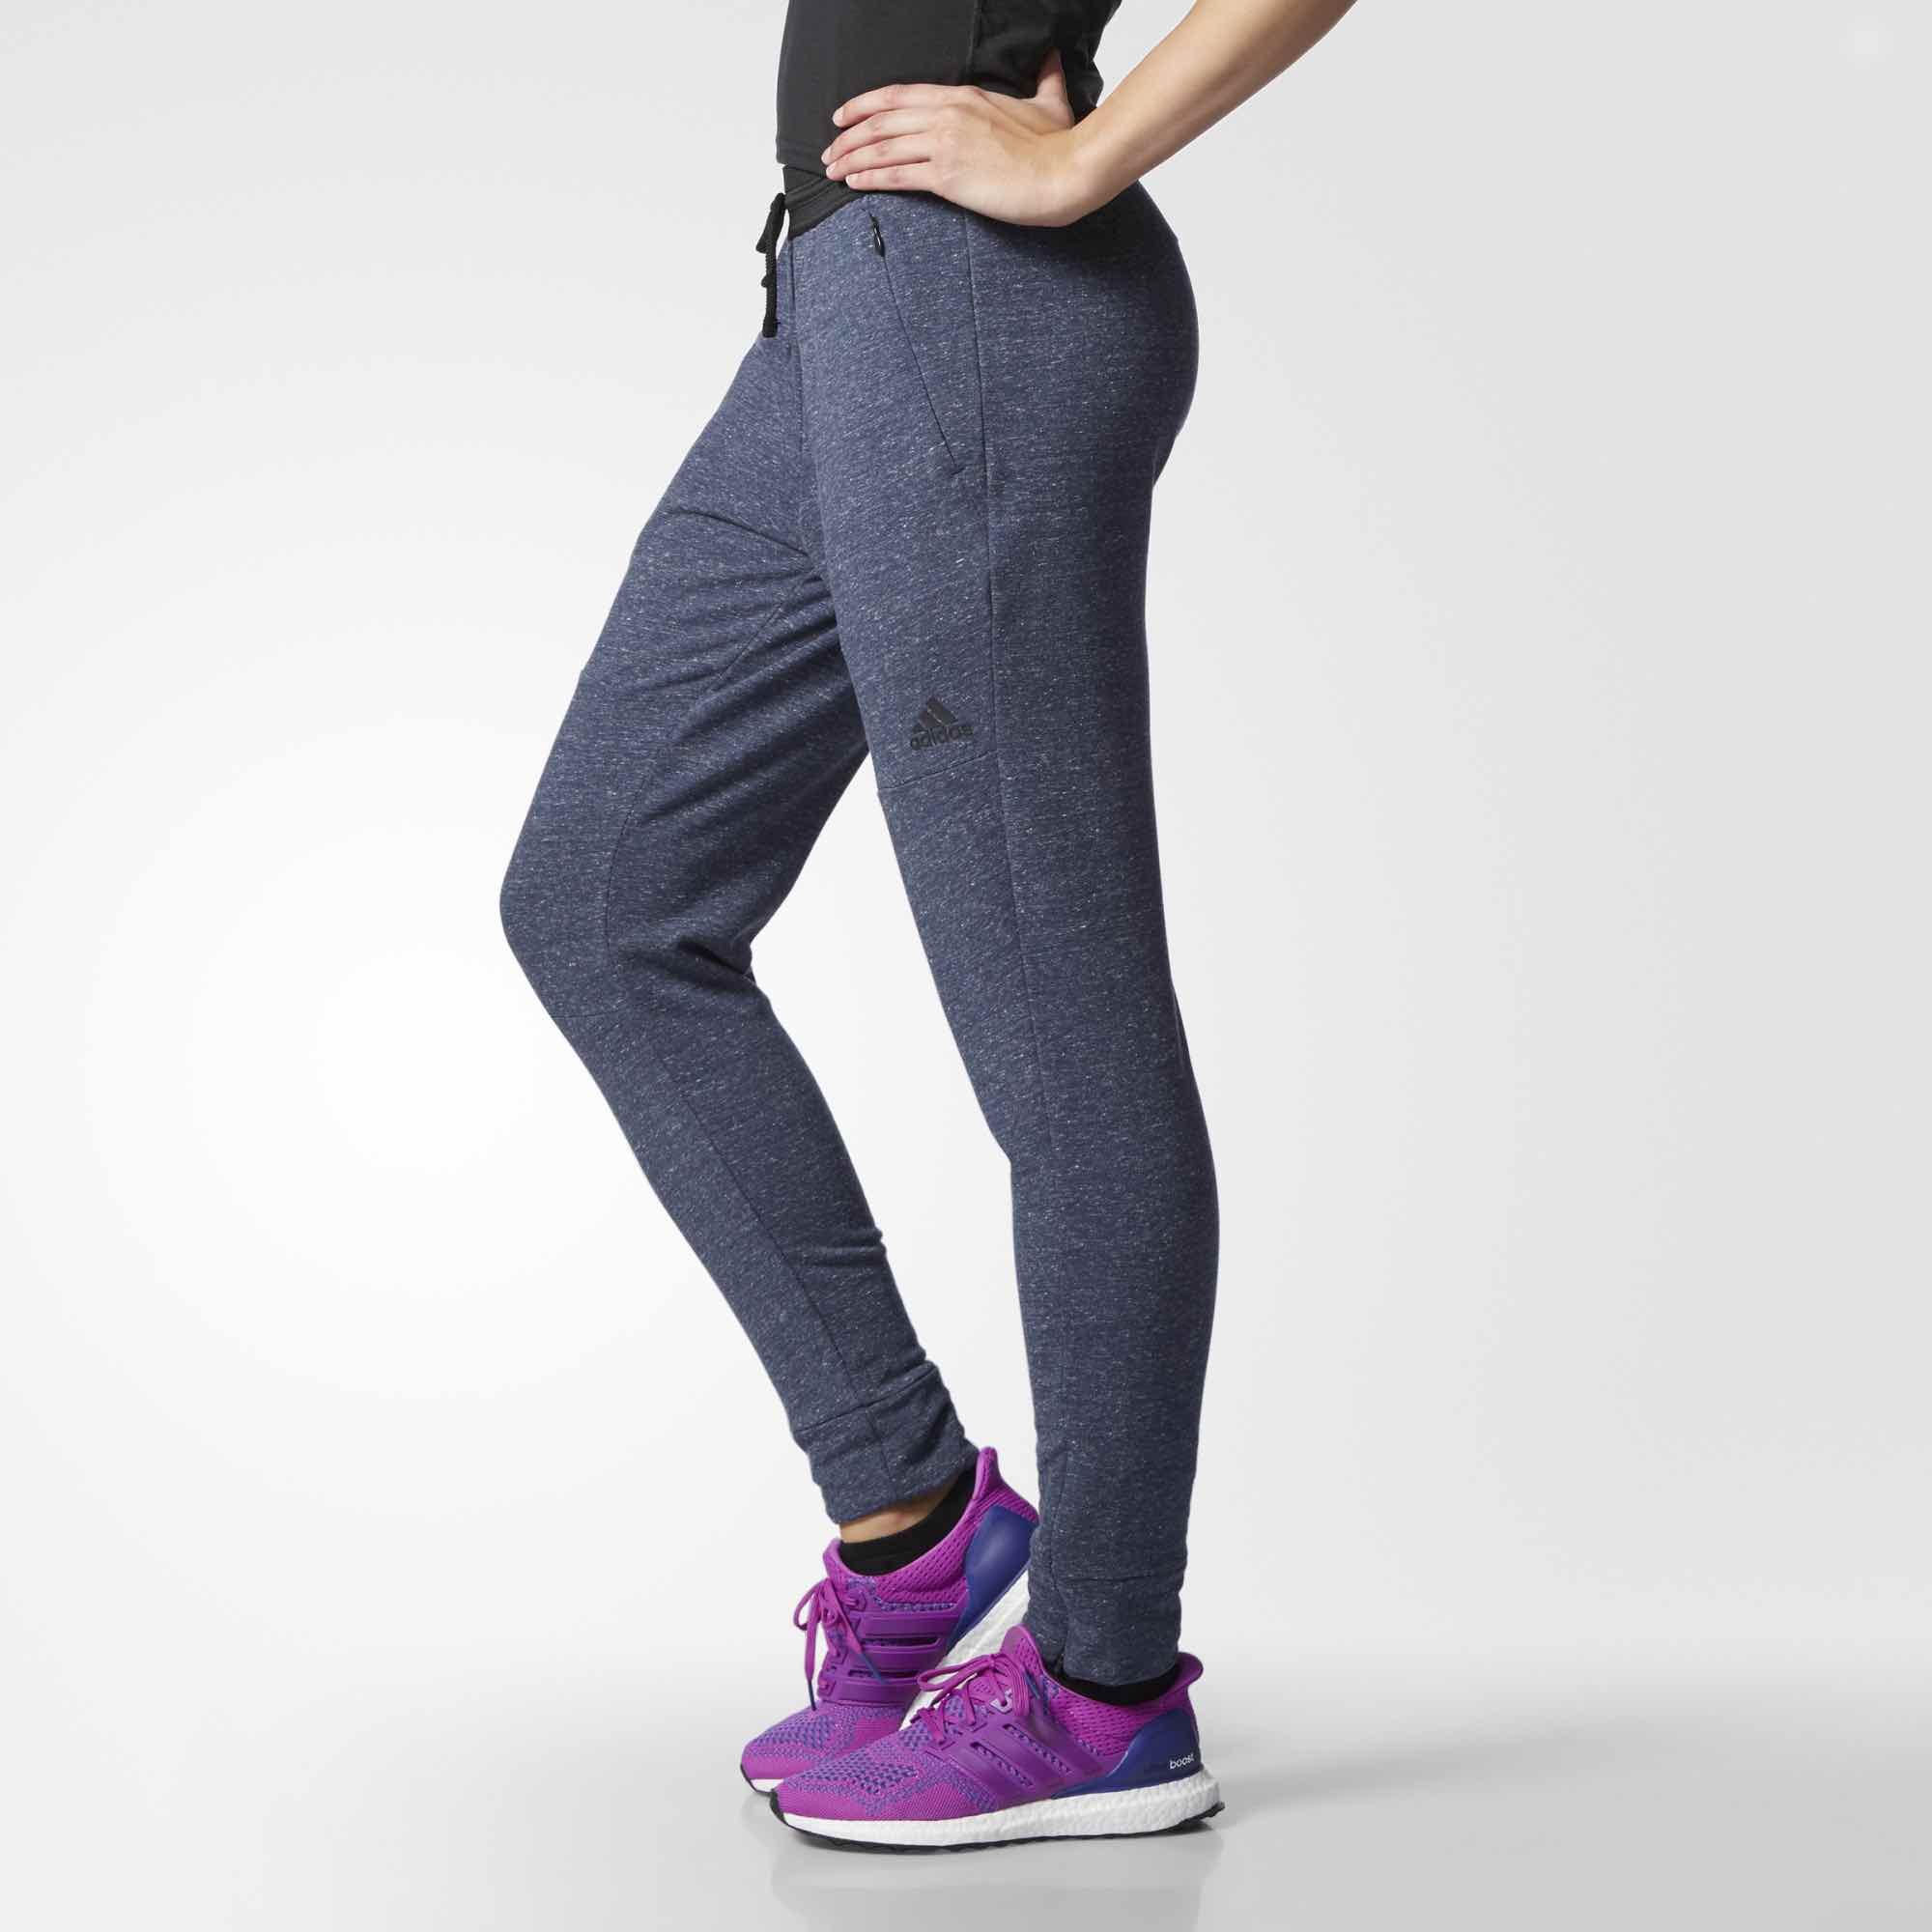 16e96257 Hjem TILBUD Adidas Tappered Pant joggebukse - blå. Previous; Next